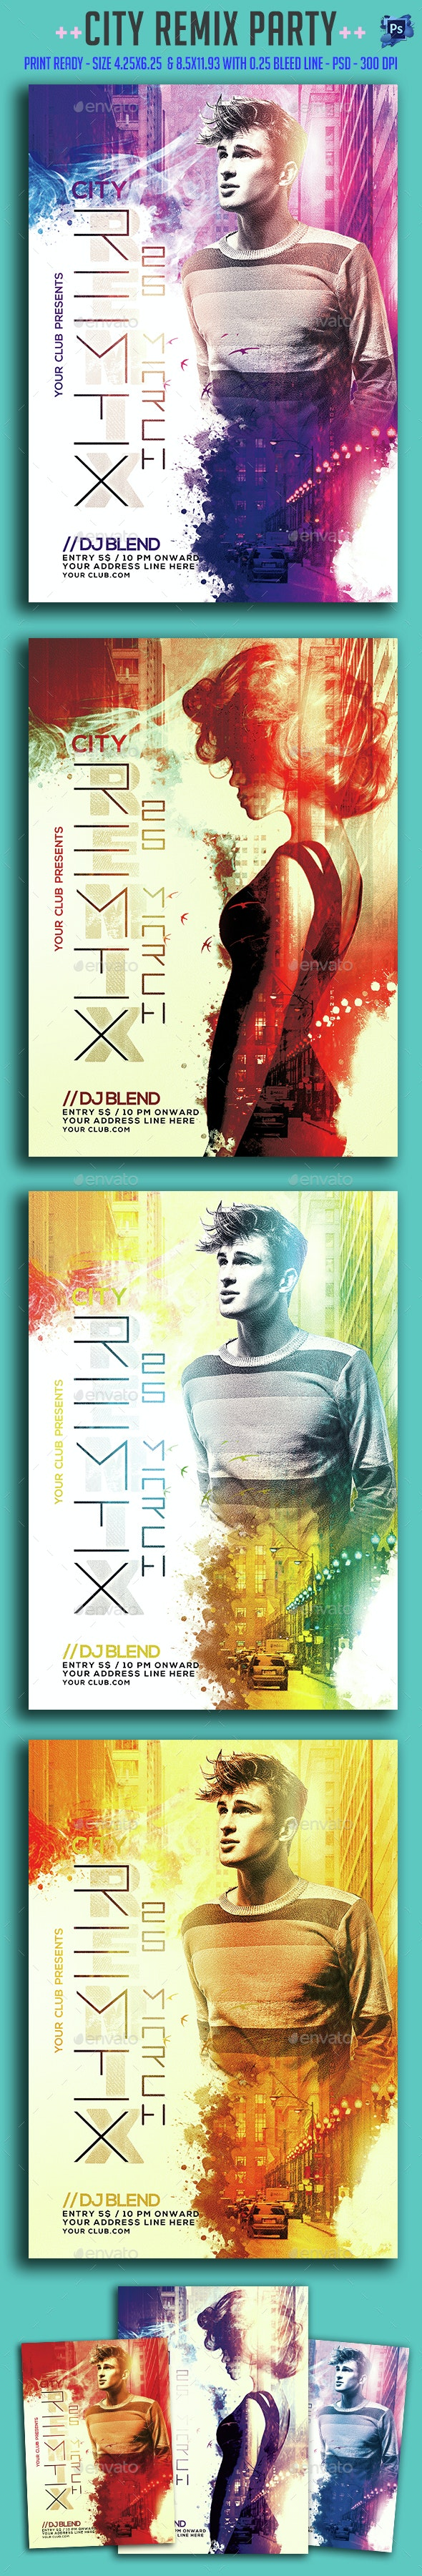 City Remix Party Flyer - Clubs & Parties Events